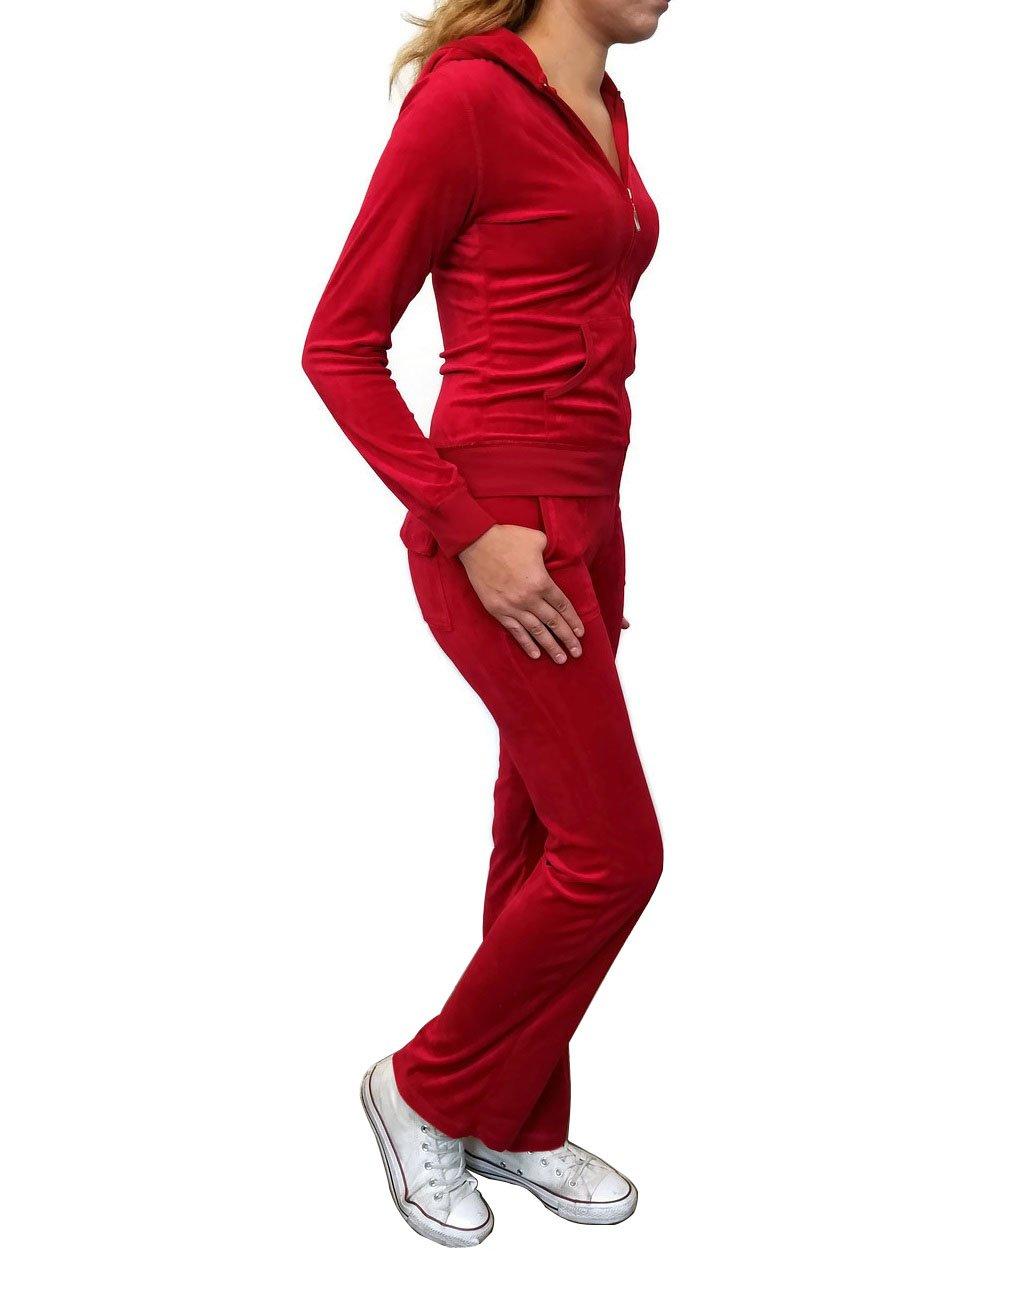 Women's Zip up Plush Soft Velour Jogging Track Suit (VS795110 Red, X-Large)